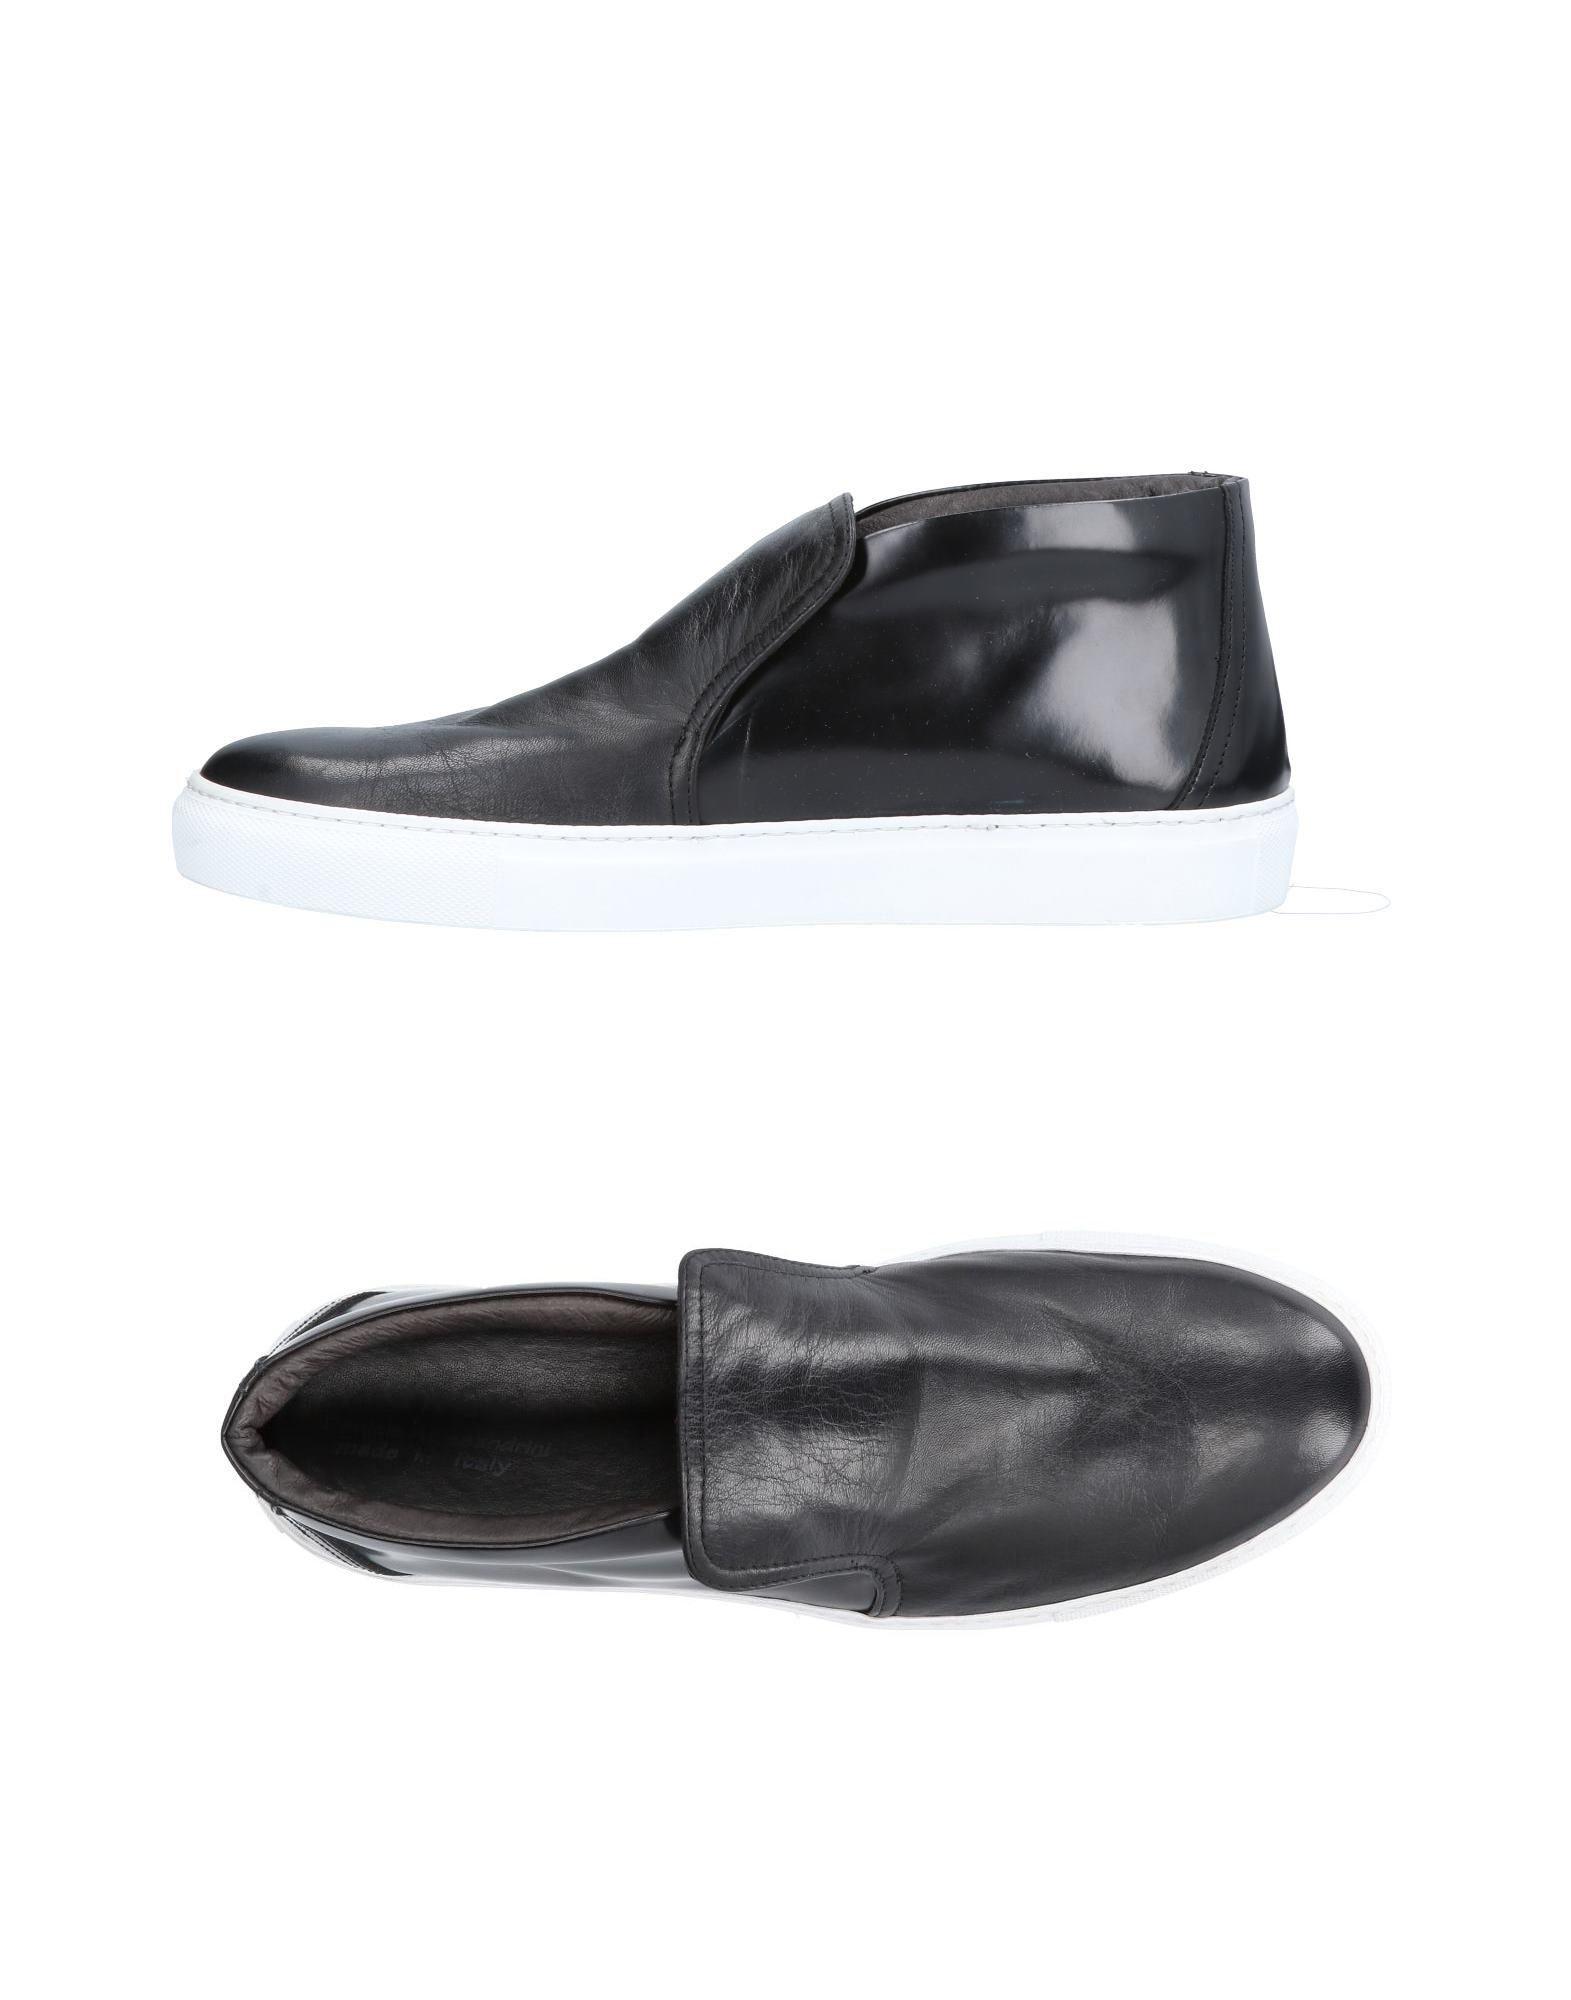 Rabatt echte Schuhe Herren Daniele Alessandrini Sneakers Herren Schuhe  11484941SR 850377